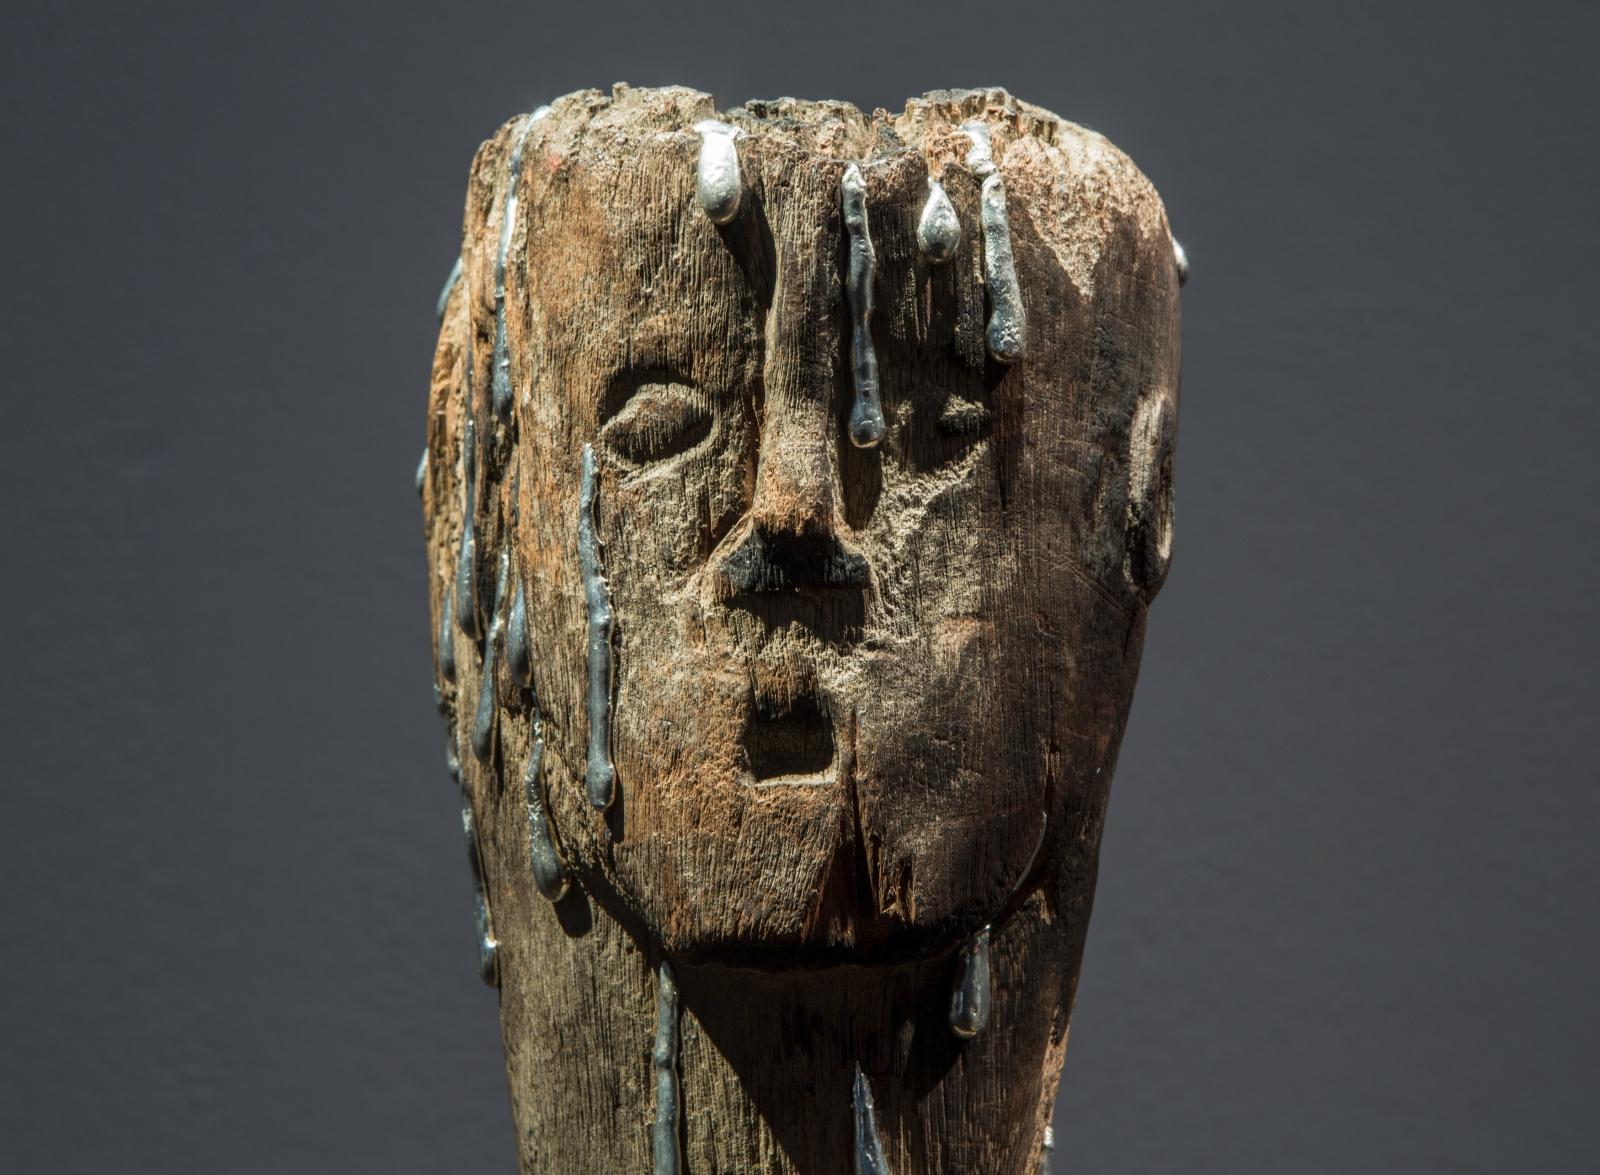 KADER ATTIA, Untitled, 2018(detail)